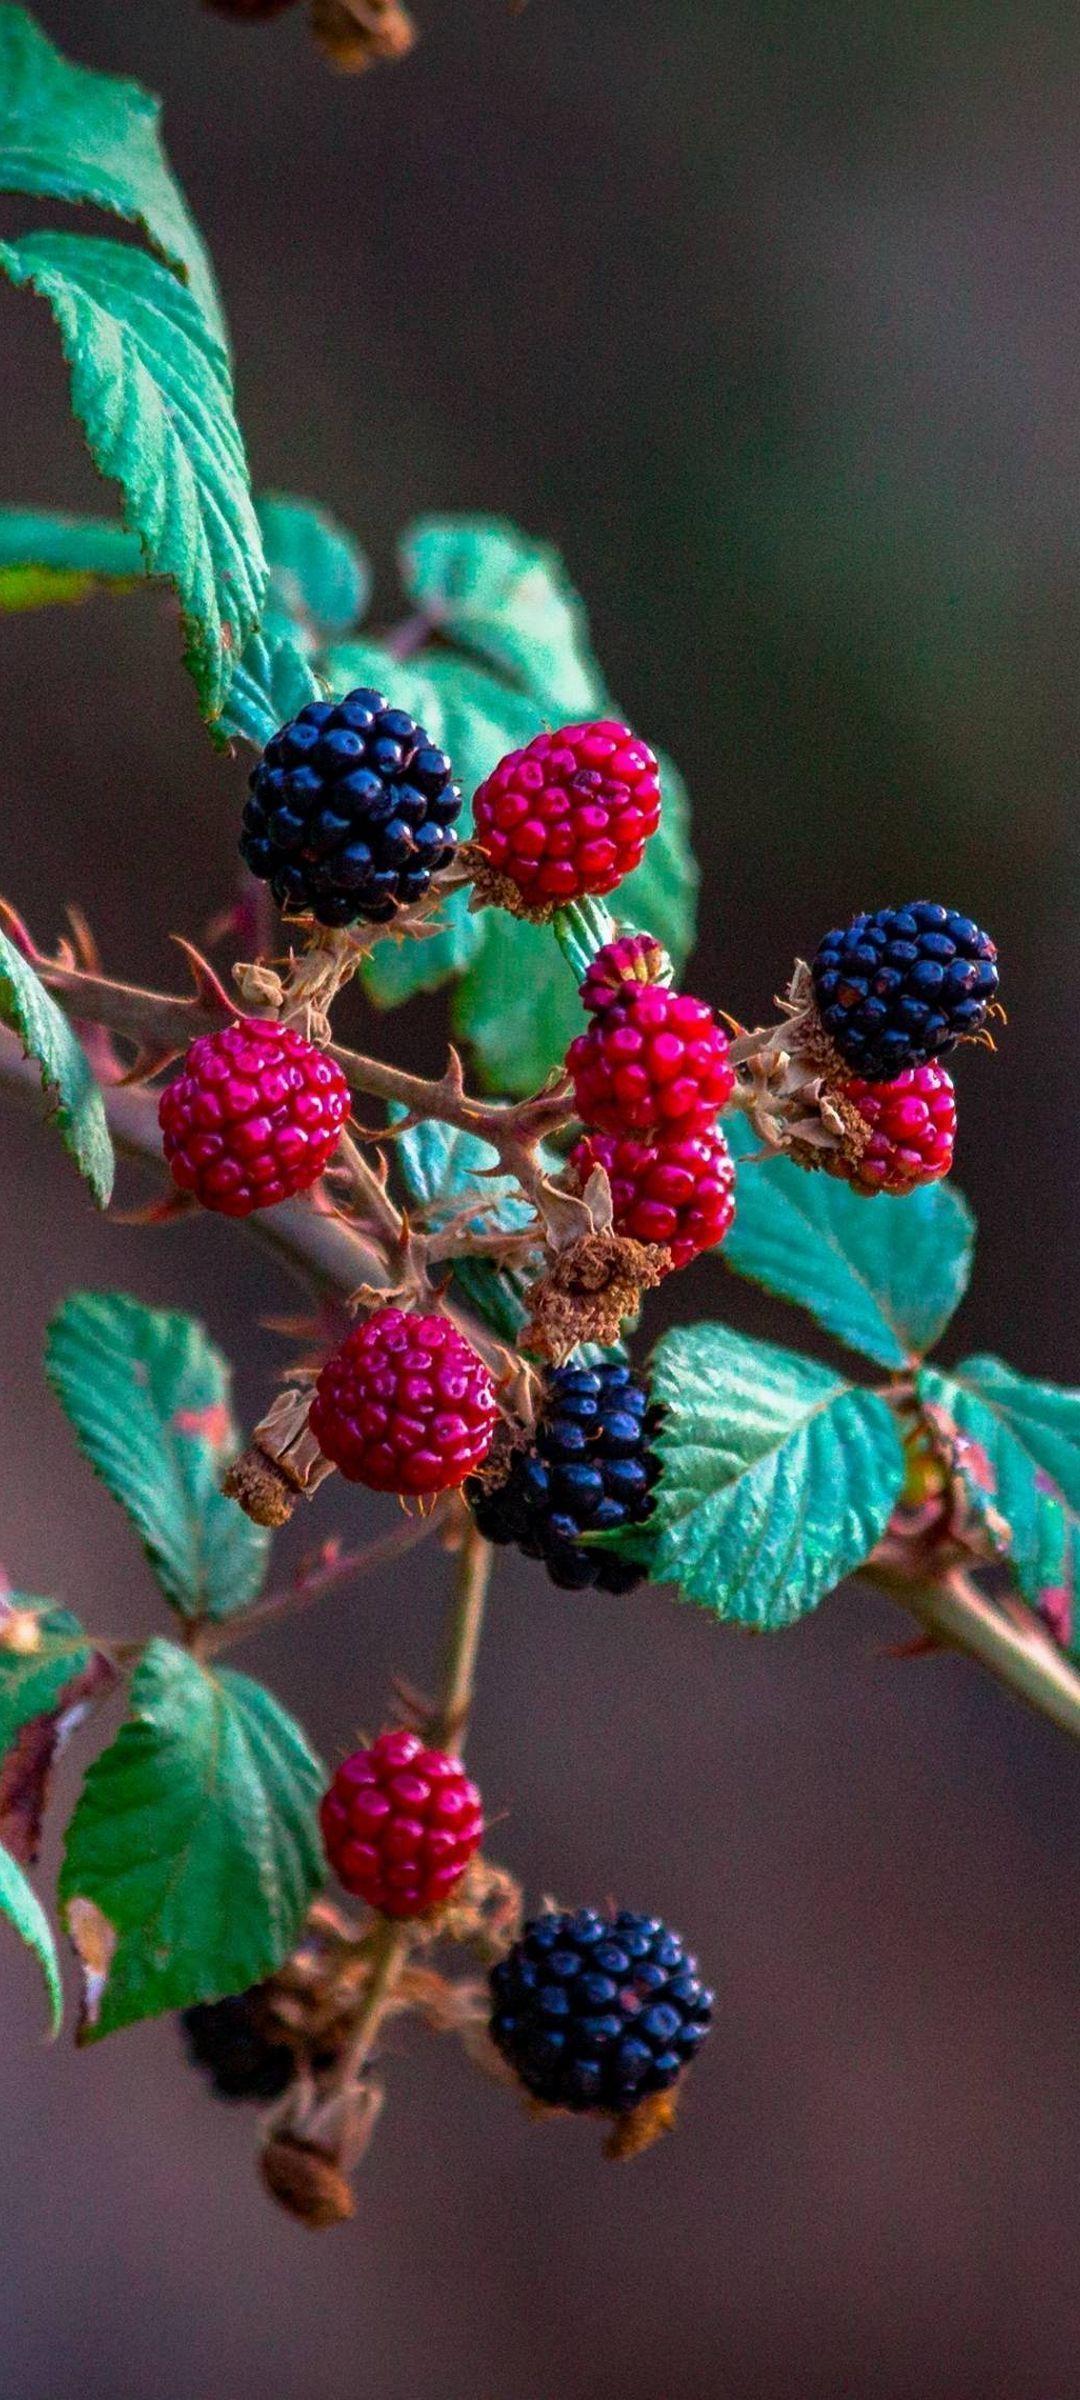 Fruits Raspberry Blackberry - [1080x2400] in 2020 | Wallpaper, Flower